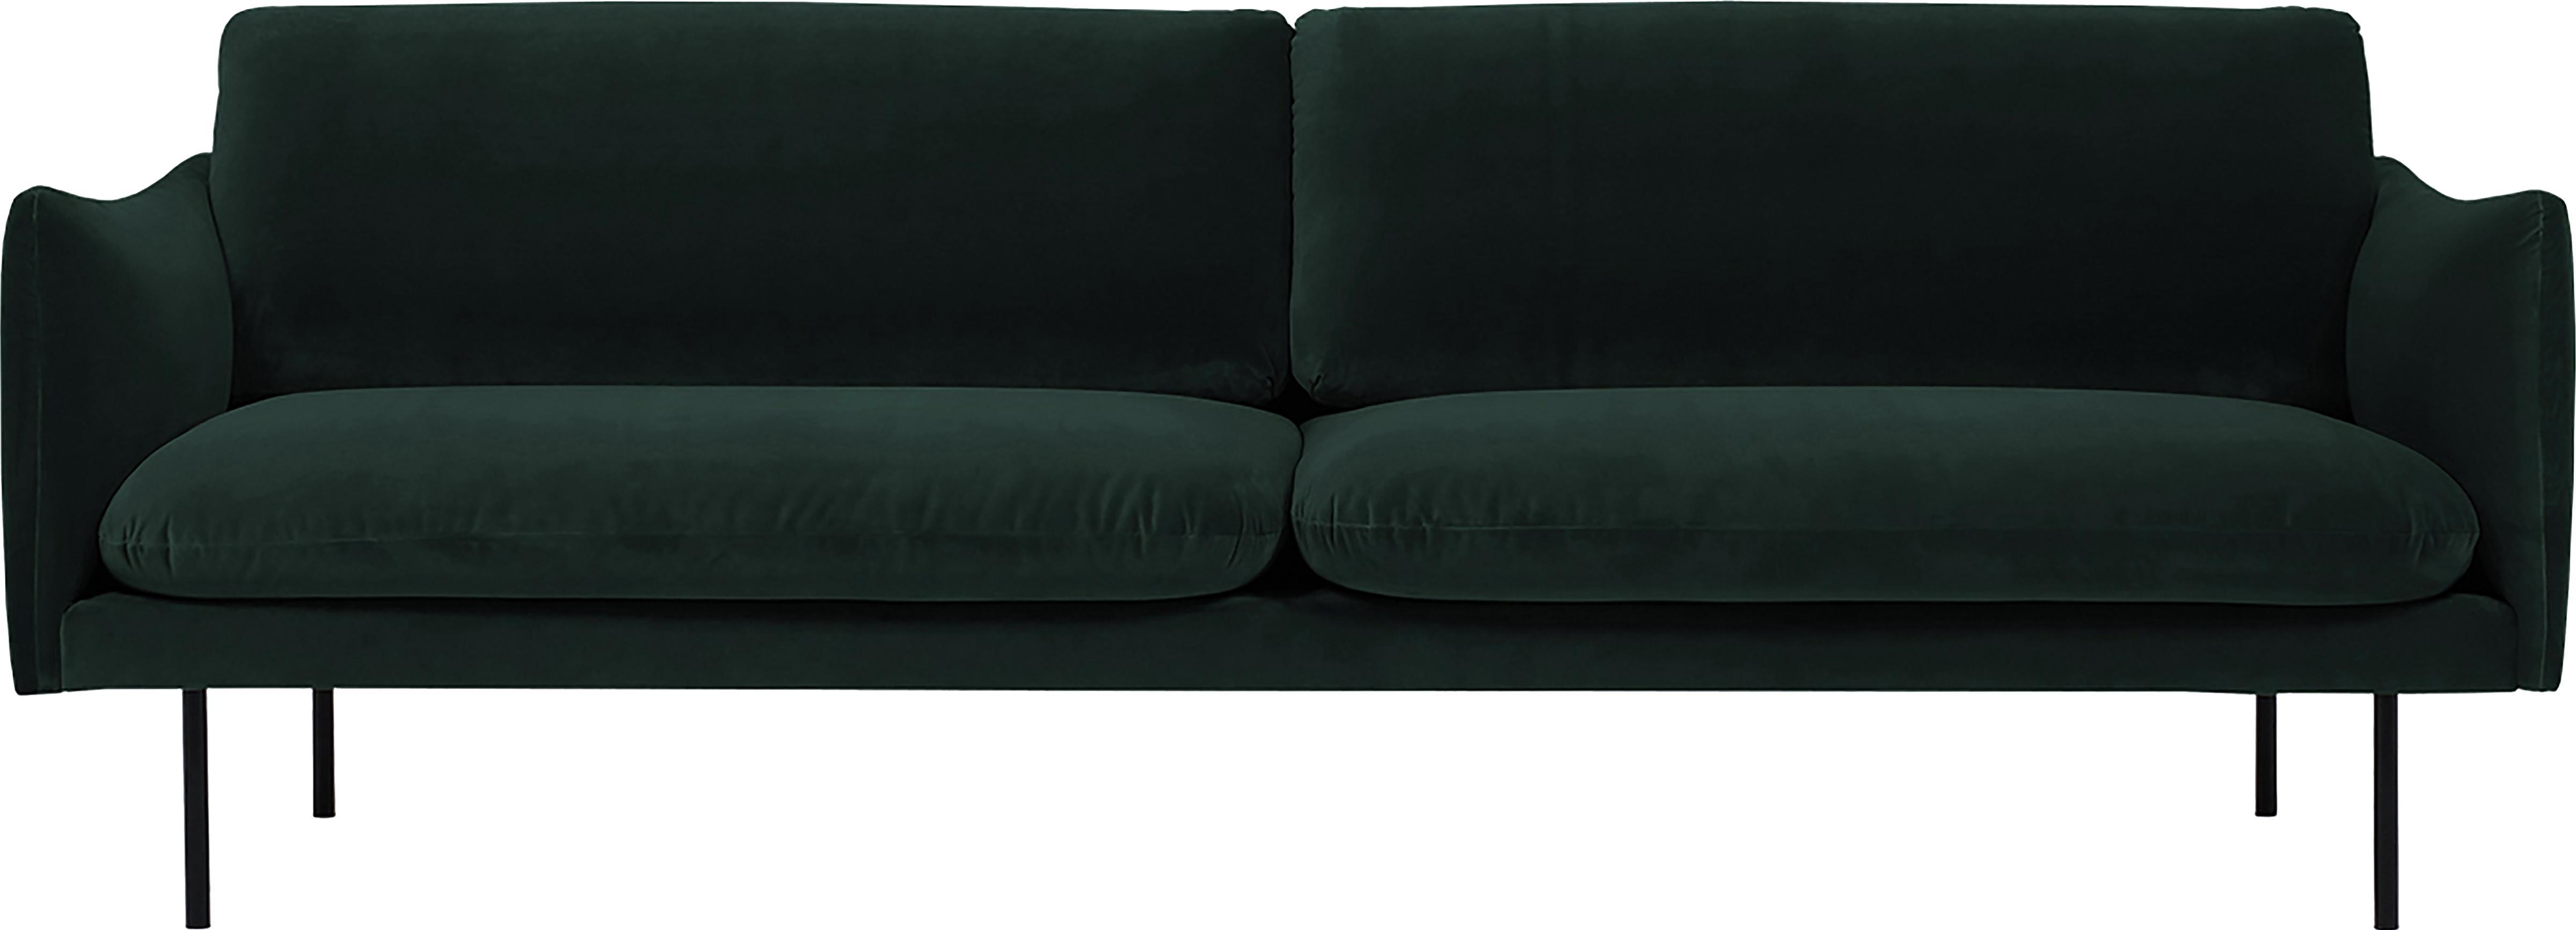 Samt-Sofa Moby (3-Sitzer), Bezug: Samt (Hochwertiger Polyes, Gestell: Massives Kiefernholz, Samt Dunkelgrün, B 220 x T 95 cm